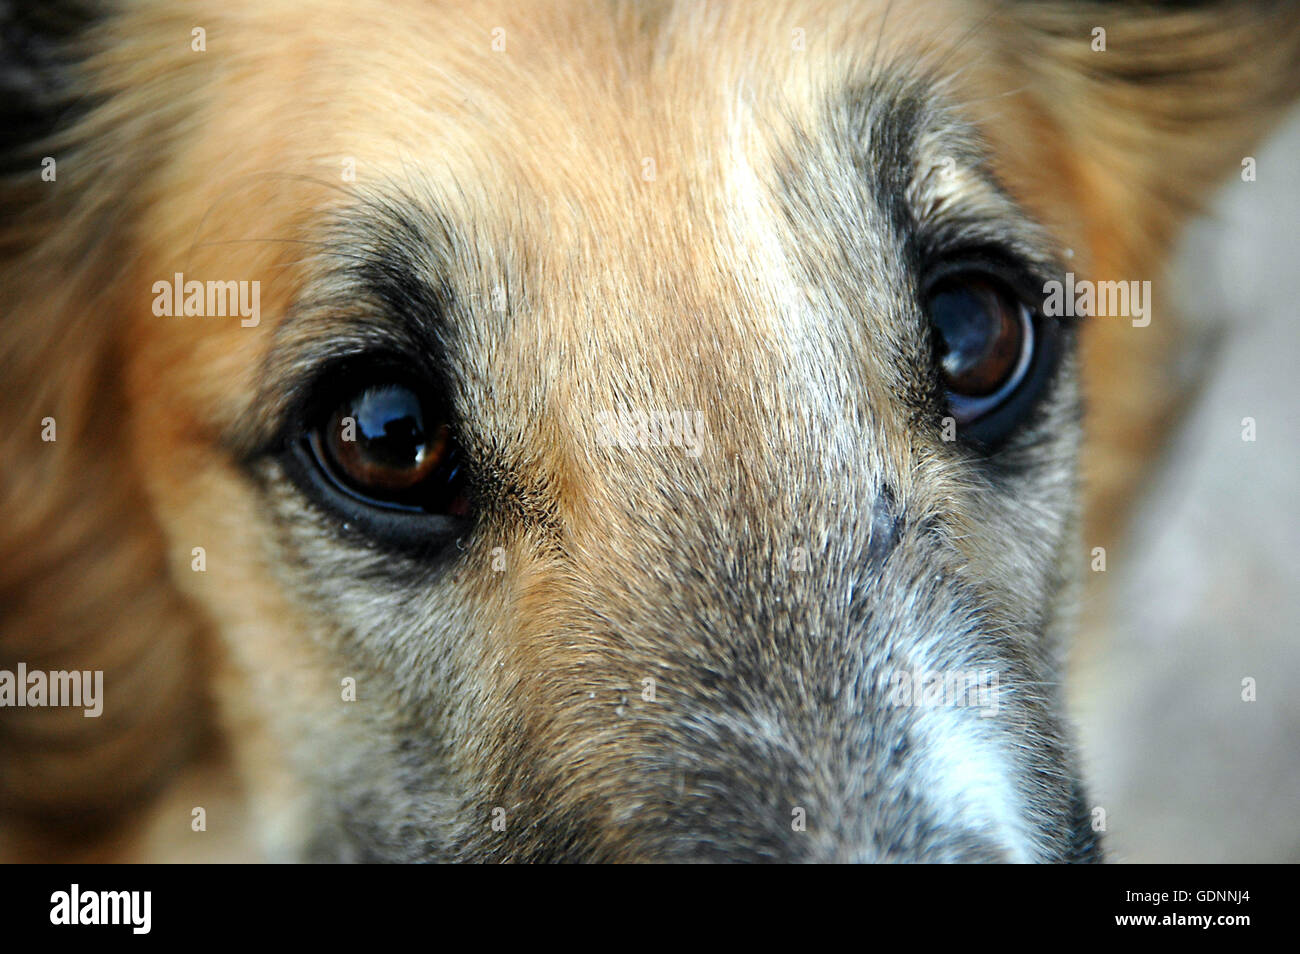 The melancholic eyes of a borzoi dog seen close. - Stock Image